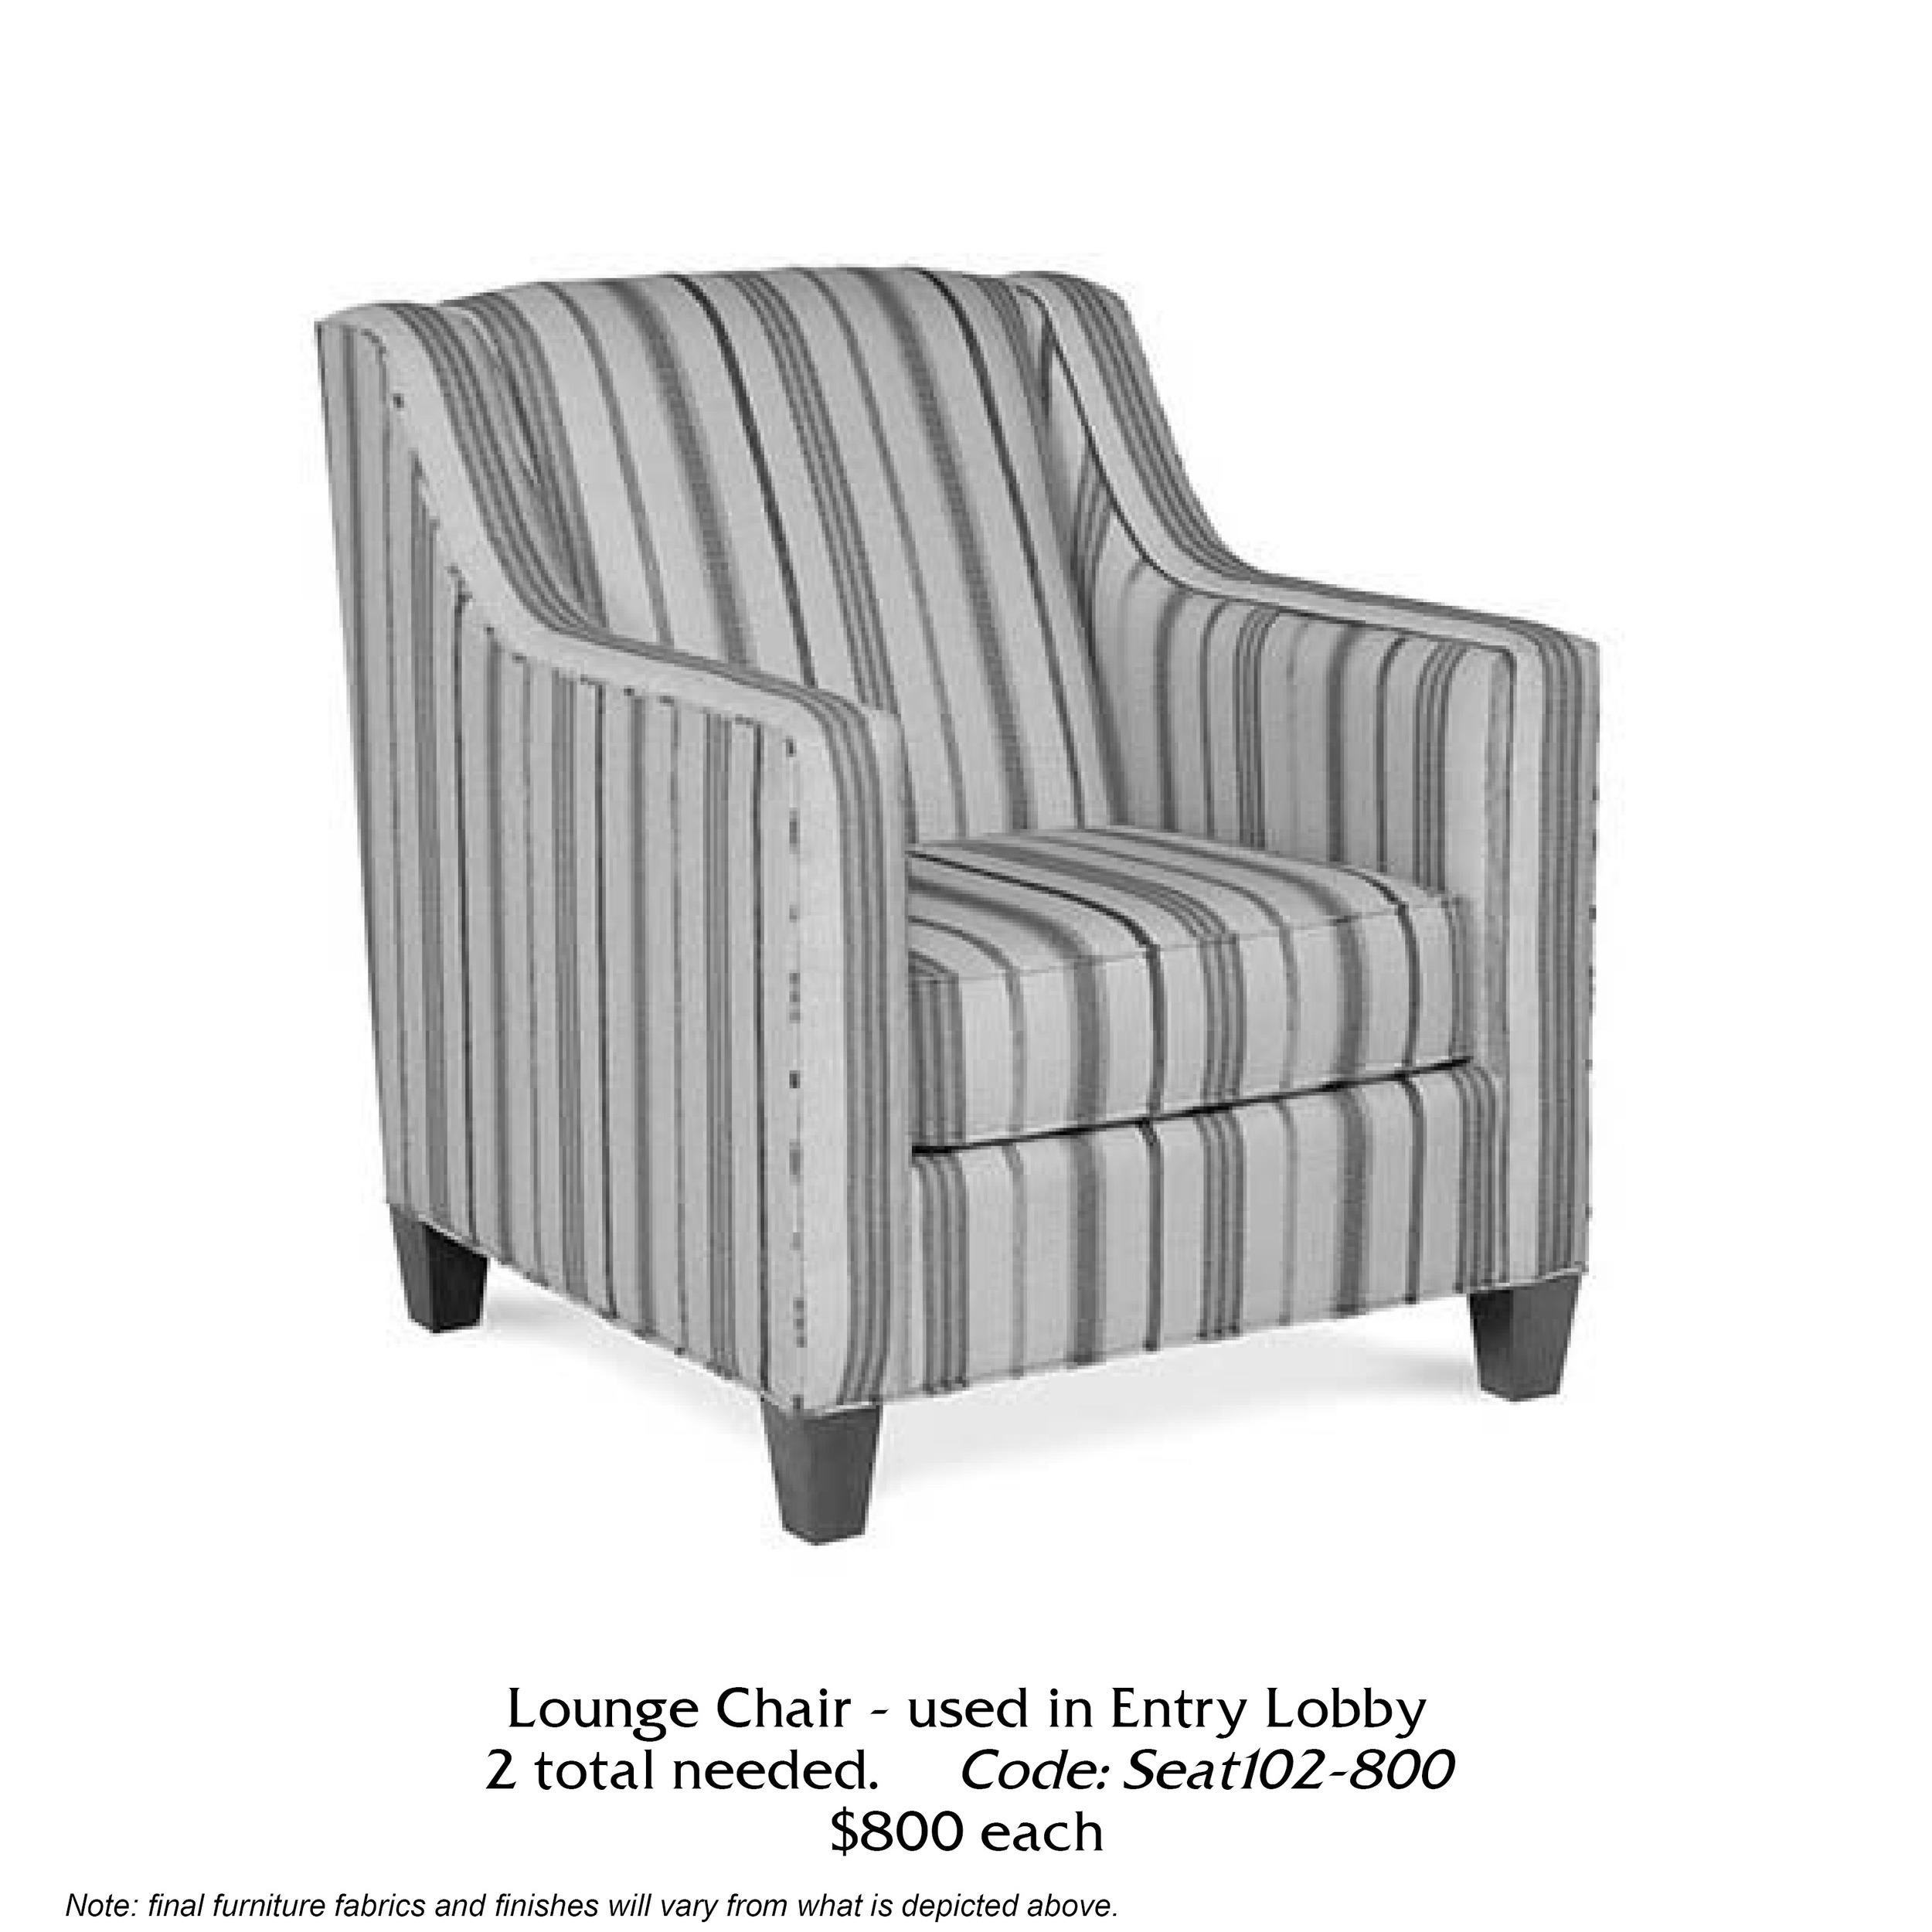 C102-F102-Lounge Chair - 2.jpg